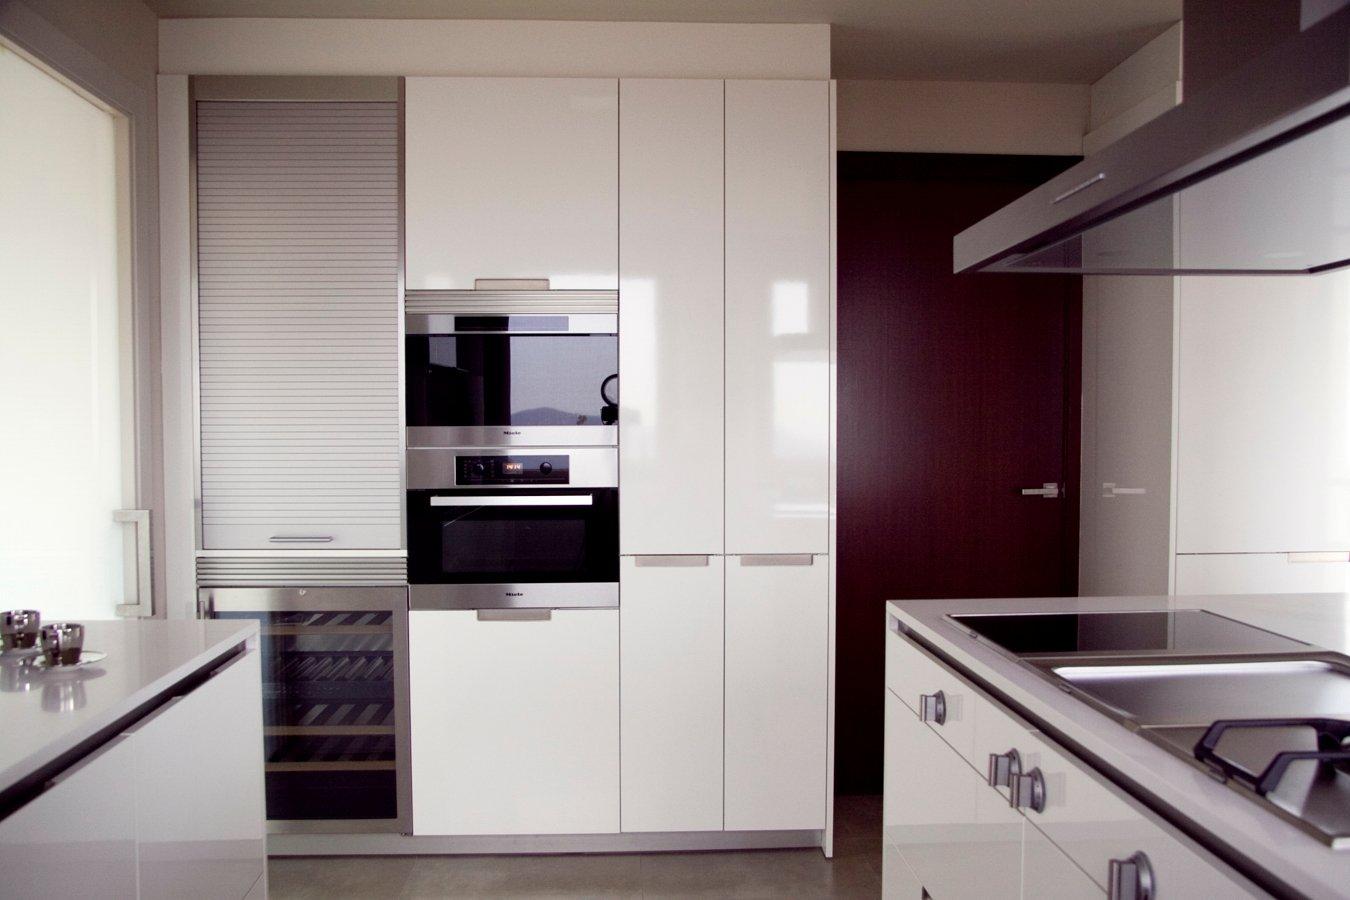 Stunning Muebles De Cocina En Ourense Images - Casa & Diseño Ideas ...